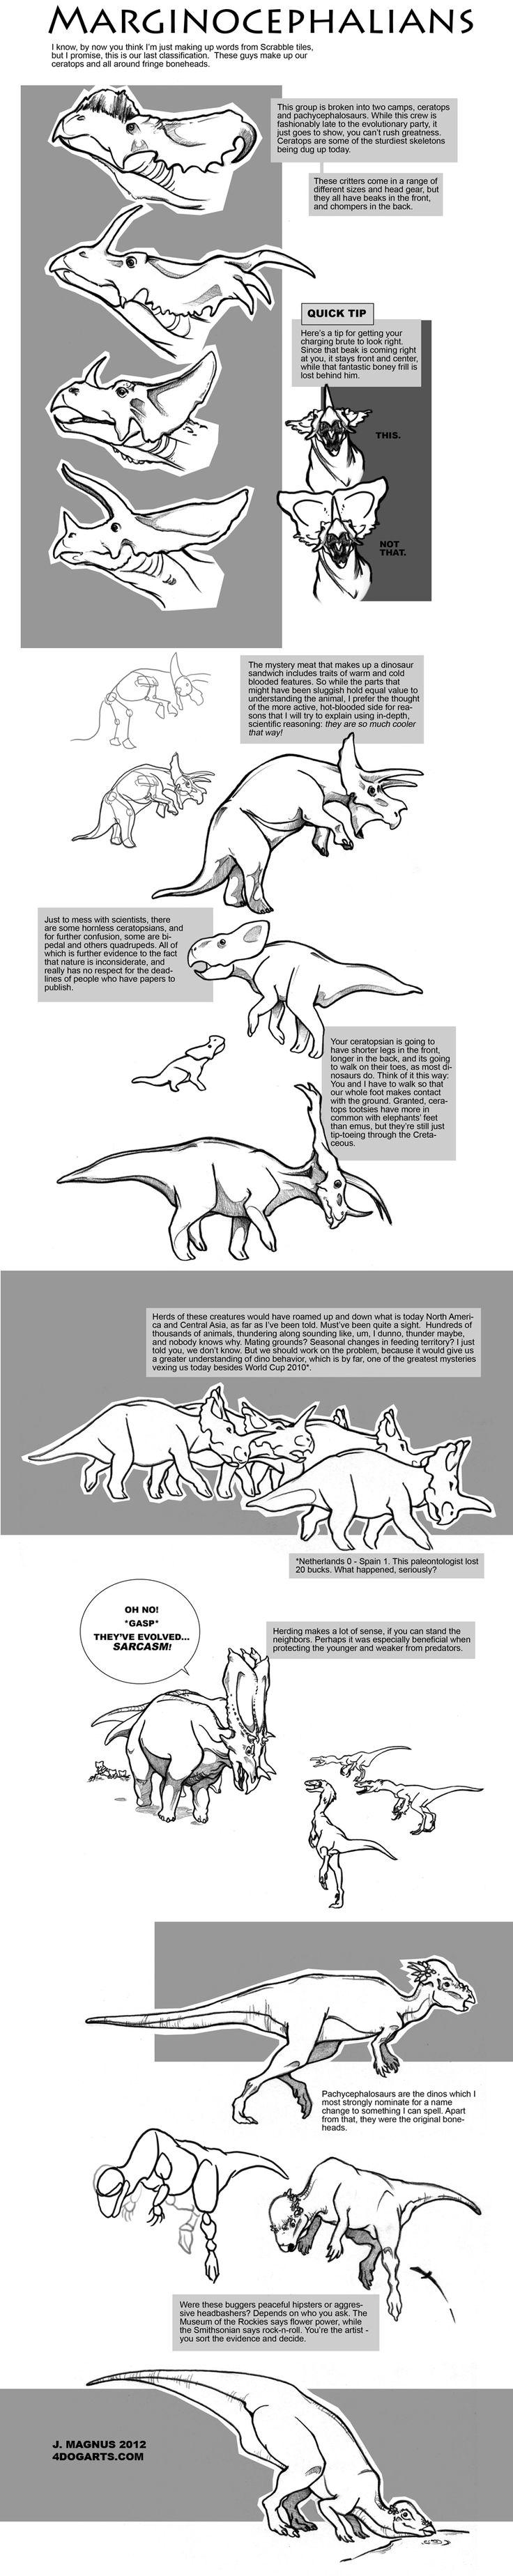 Uncategorized Dinosaur Drawing Tutorial 75 best dinosaurs images on pinterest dog art and how marginocephalia tutorial by sketcherjak deviantart